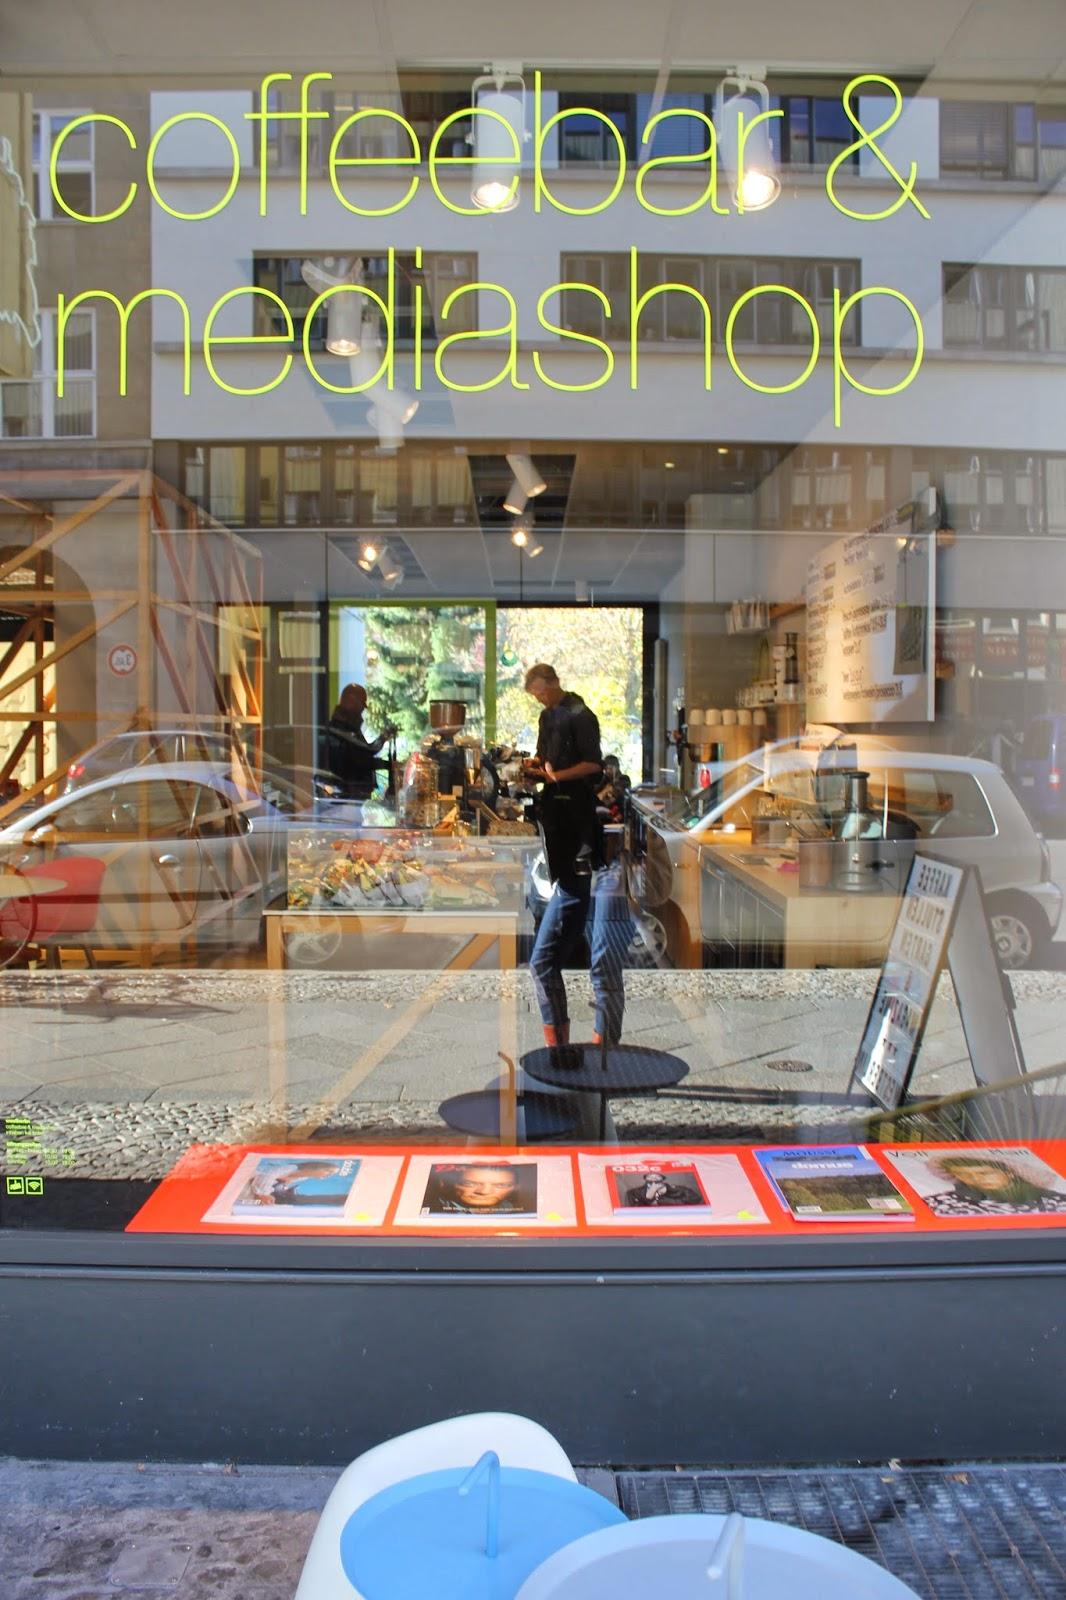 anneliwest berlin westberlin coffeebar mediashop. Black Bedroom Furniture Sets. Home Design Ideas